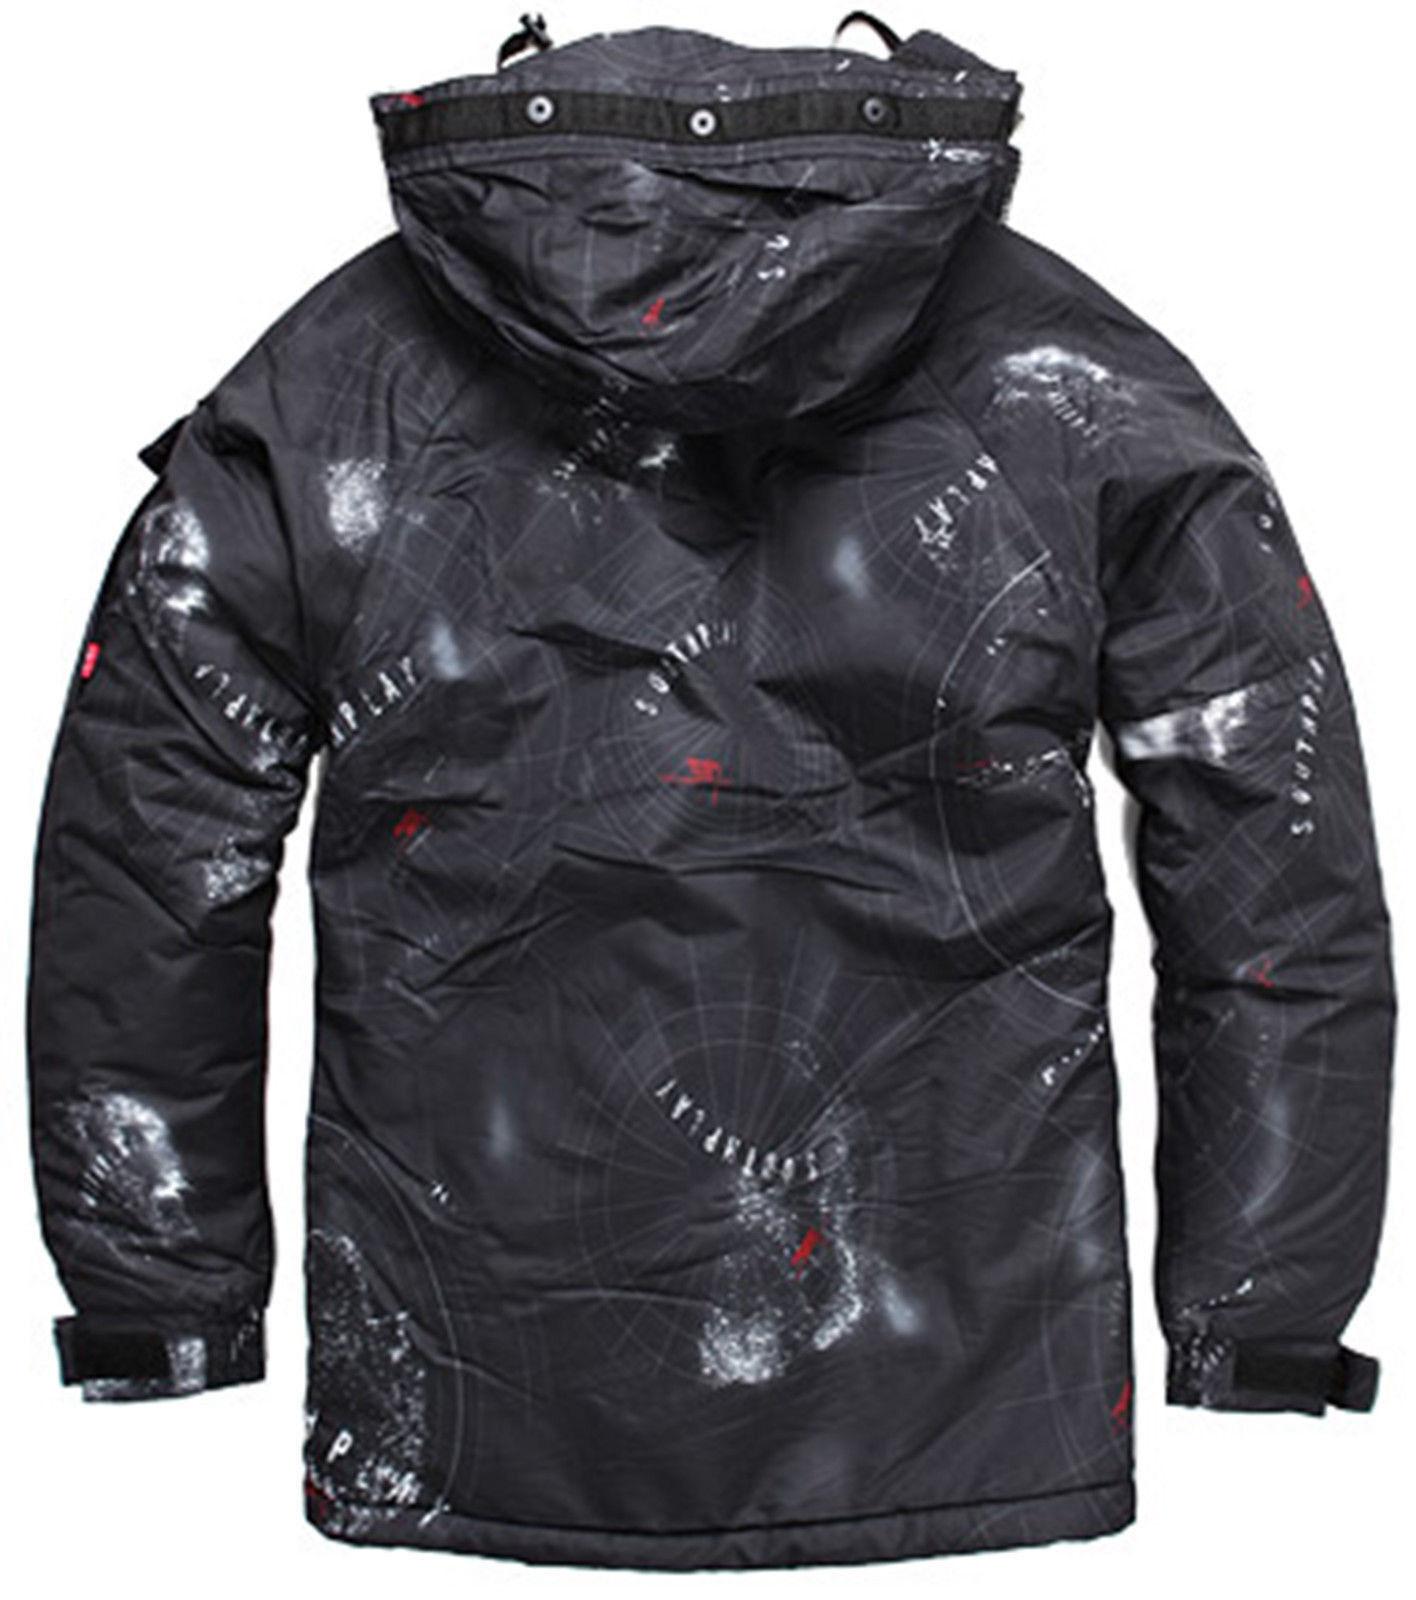 2019 2019 2019 SouthPlay Military Gemusterte Wasserdichte Oberbekleidung Jacke Space f77f6c